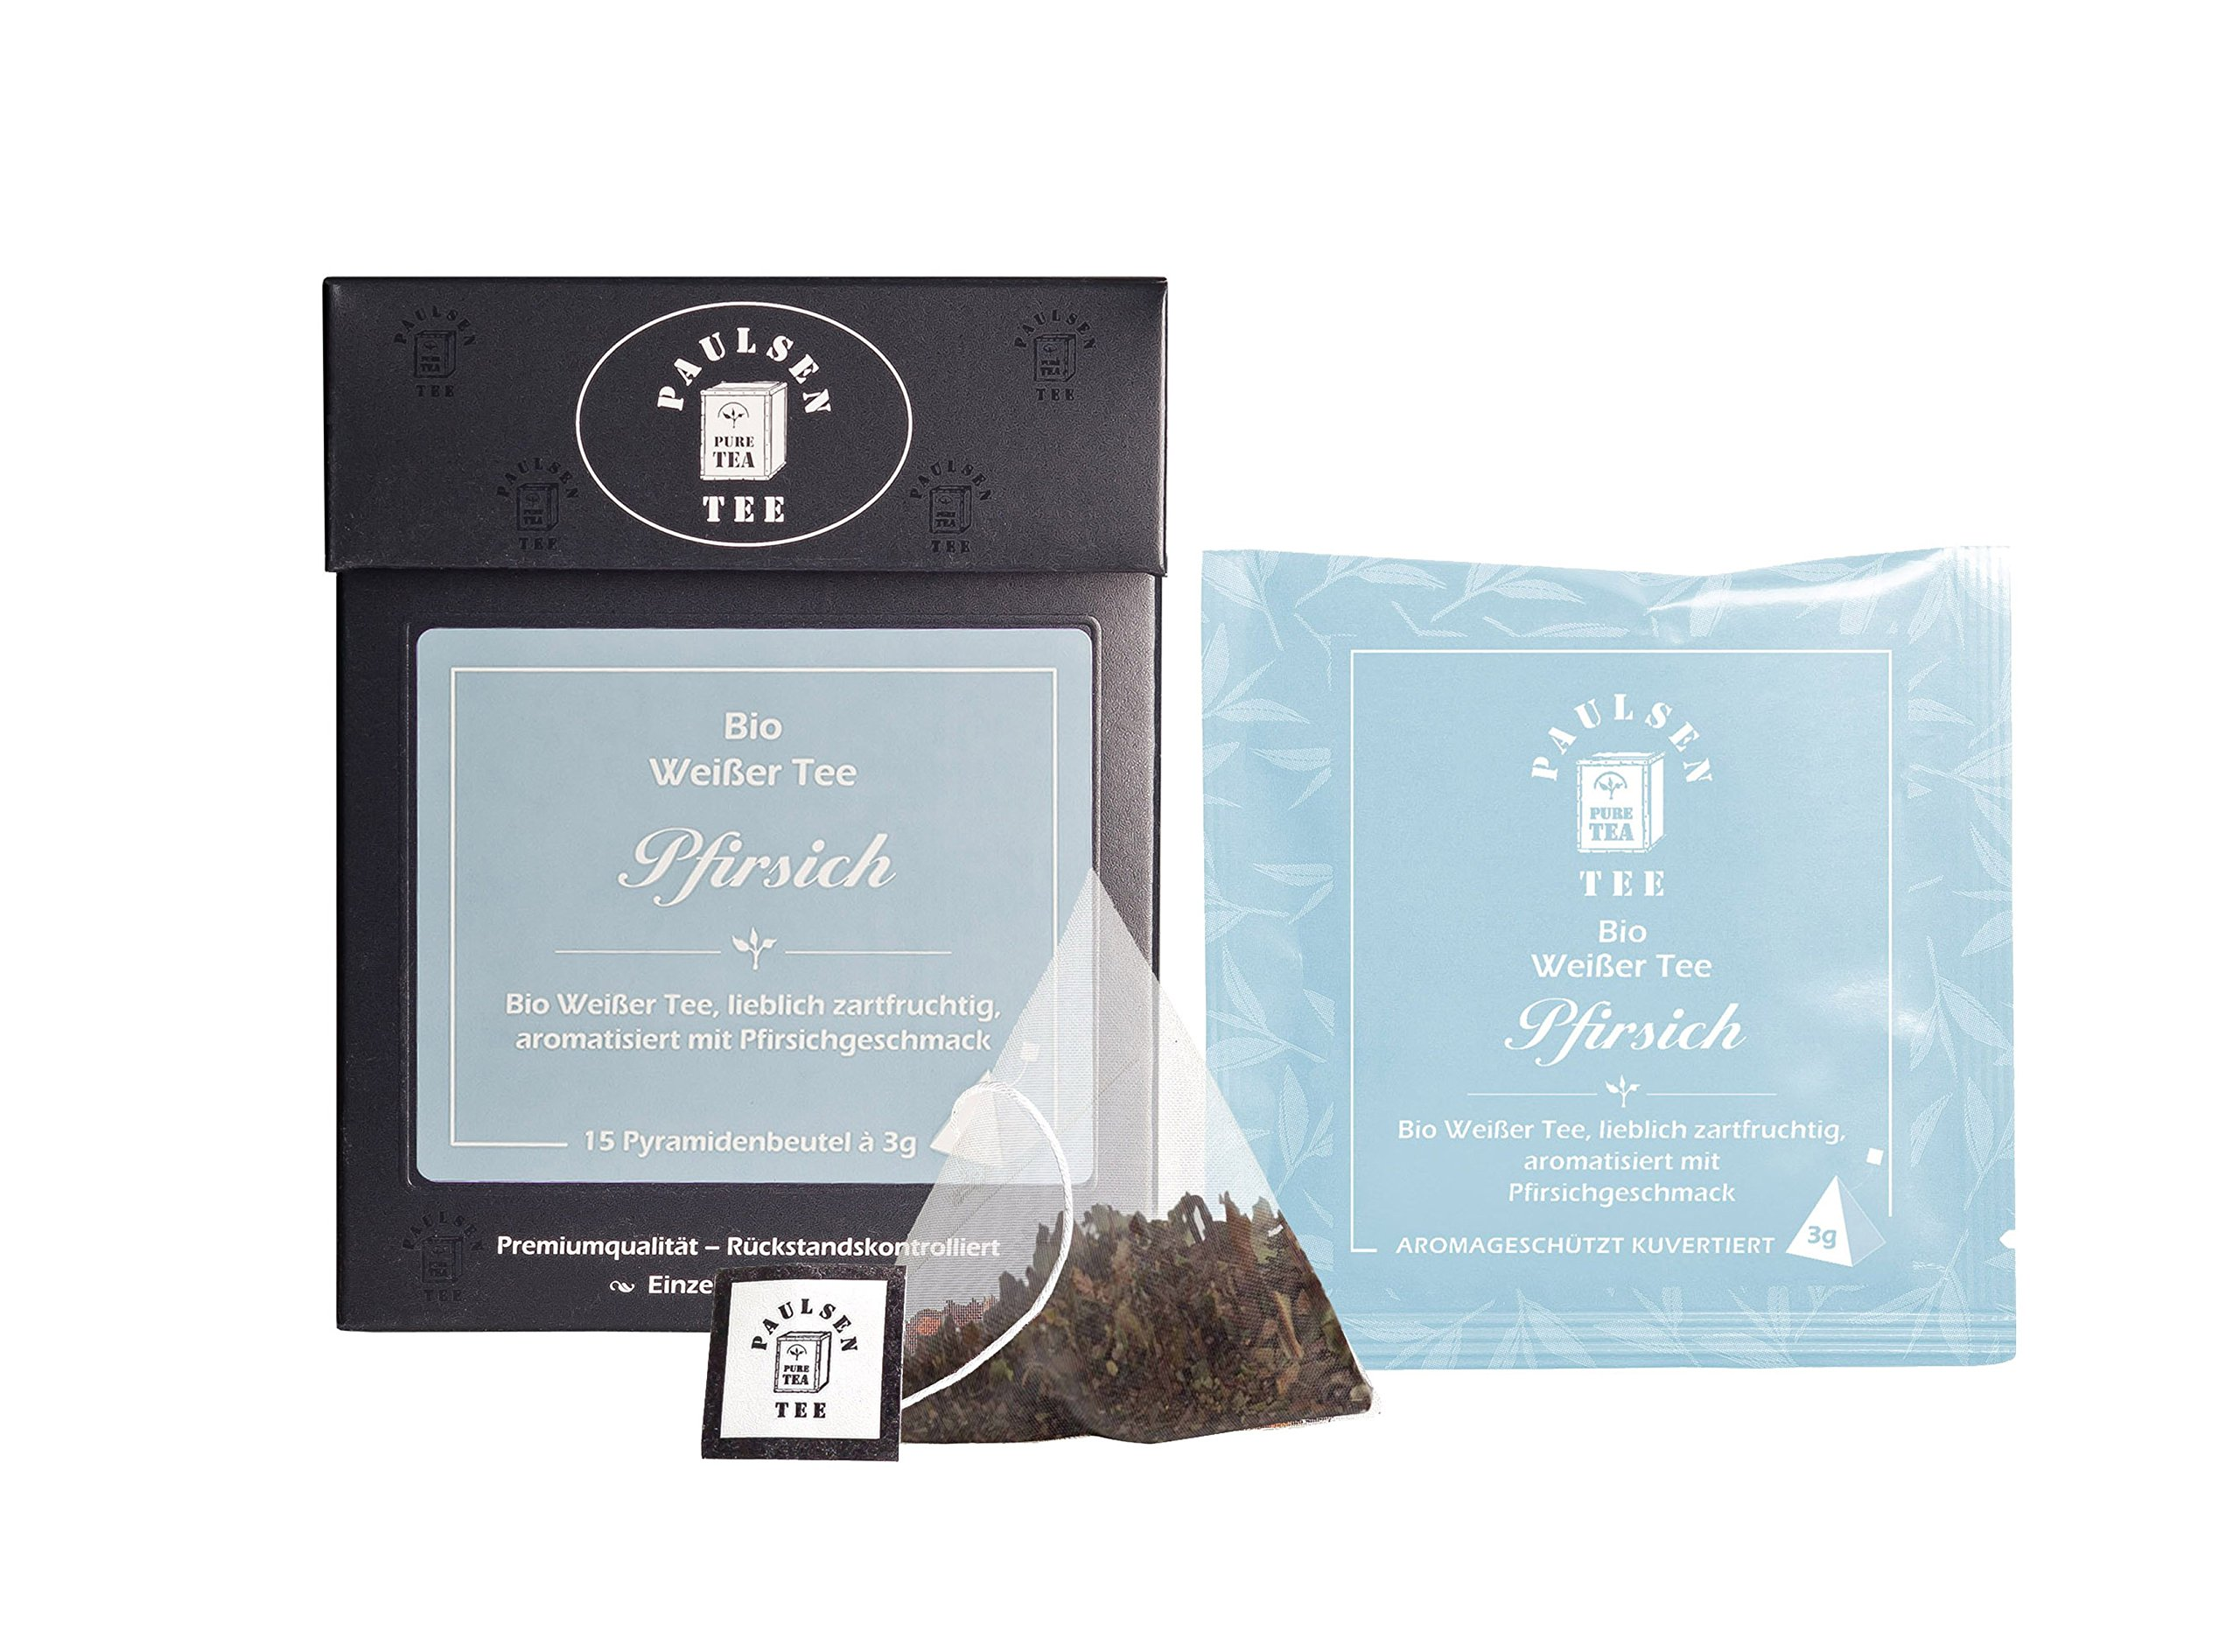 Paulsen-Tee-Pyramidenbeutel-Pfirsich-Weier-Tee-15-x-3g-Bio